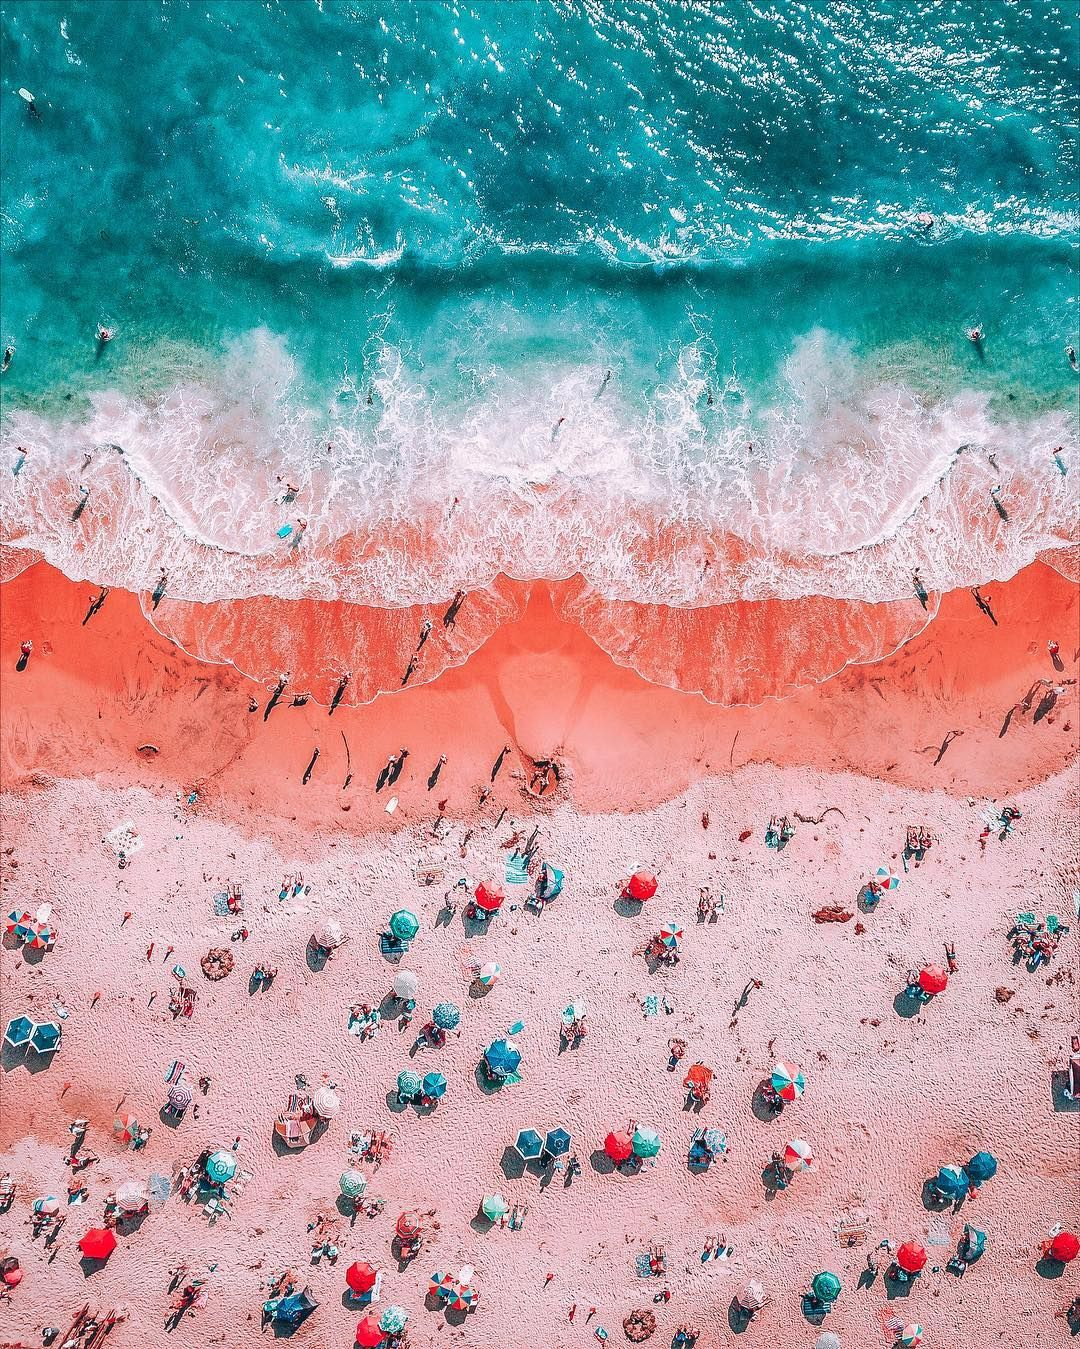 Niaz Uddin5 Jpg 1080 1349 Aerial Images Pink Sand Beach Drone Photography